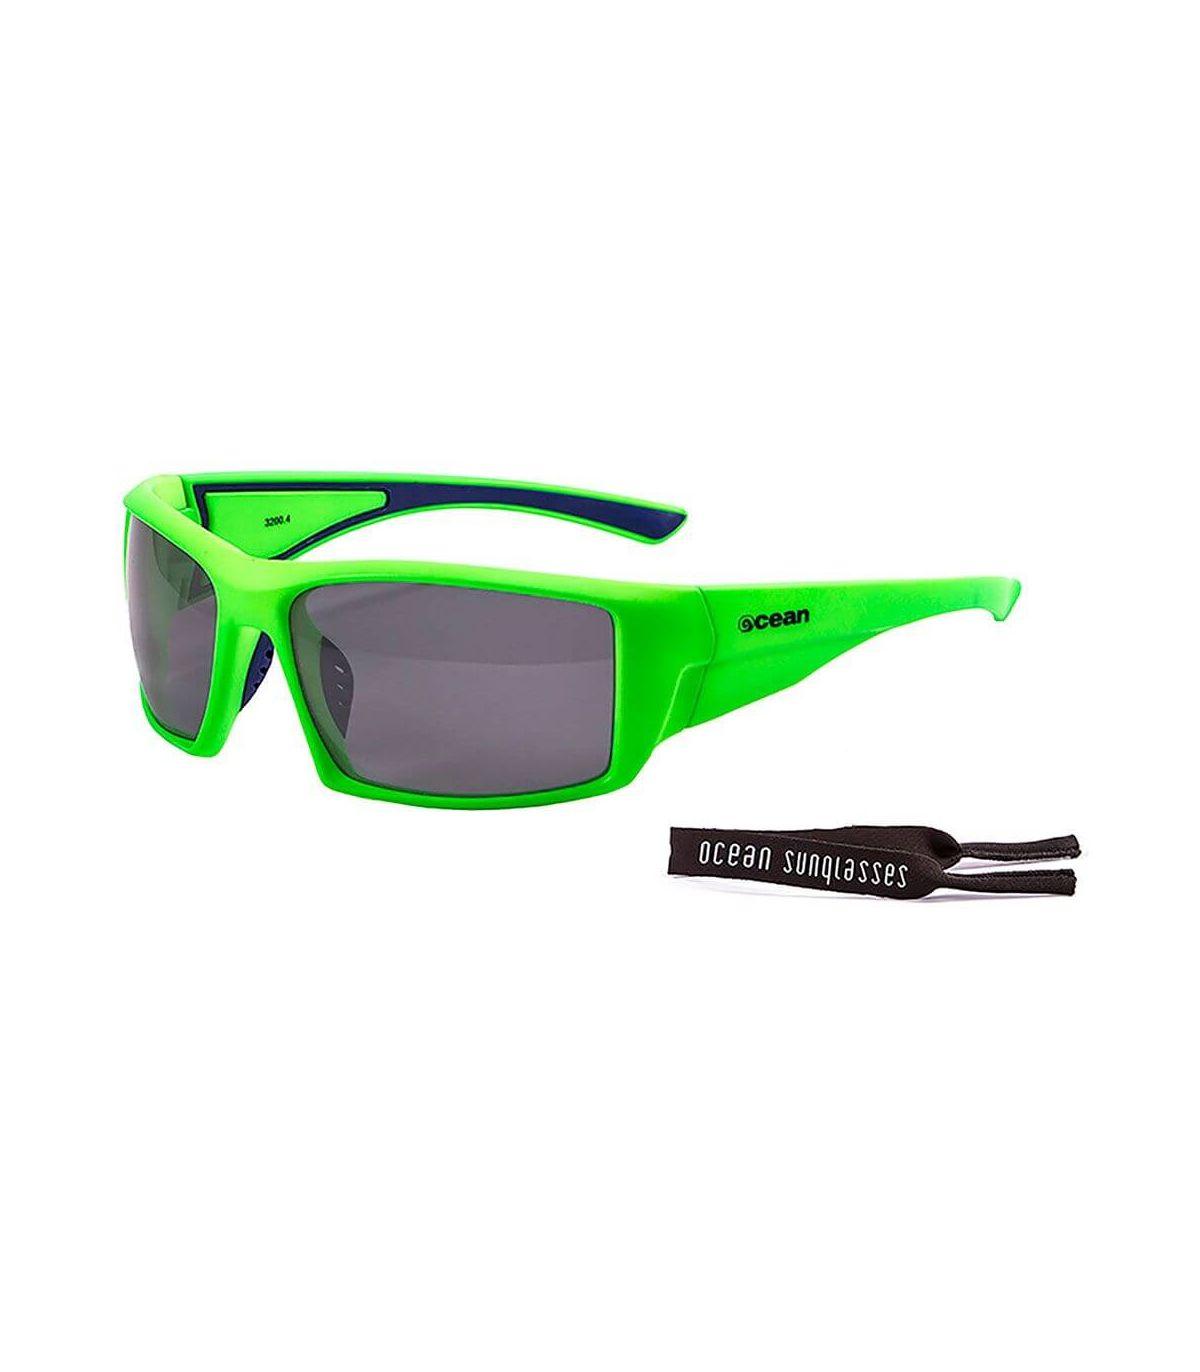 Ocean Aruba Mate Green / Smoke Ocean Sunglasses Gafas de sol Running Running Color: verde